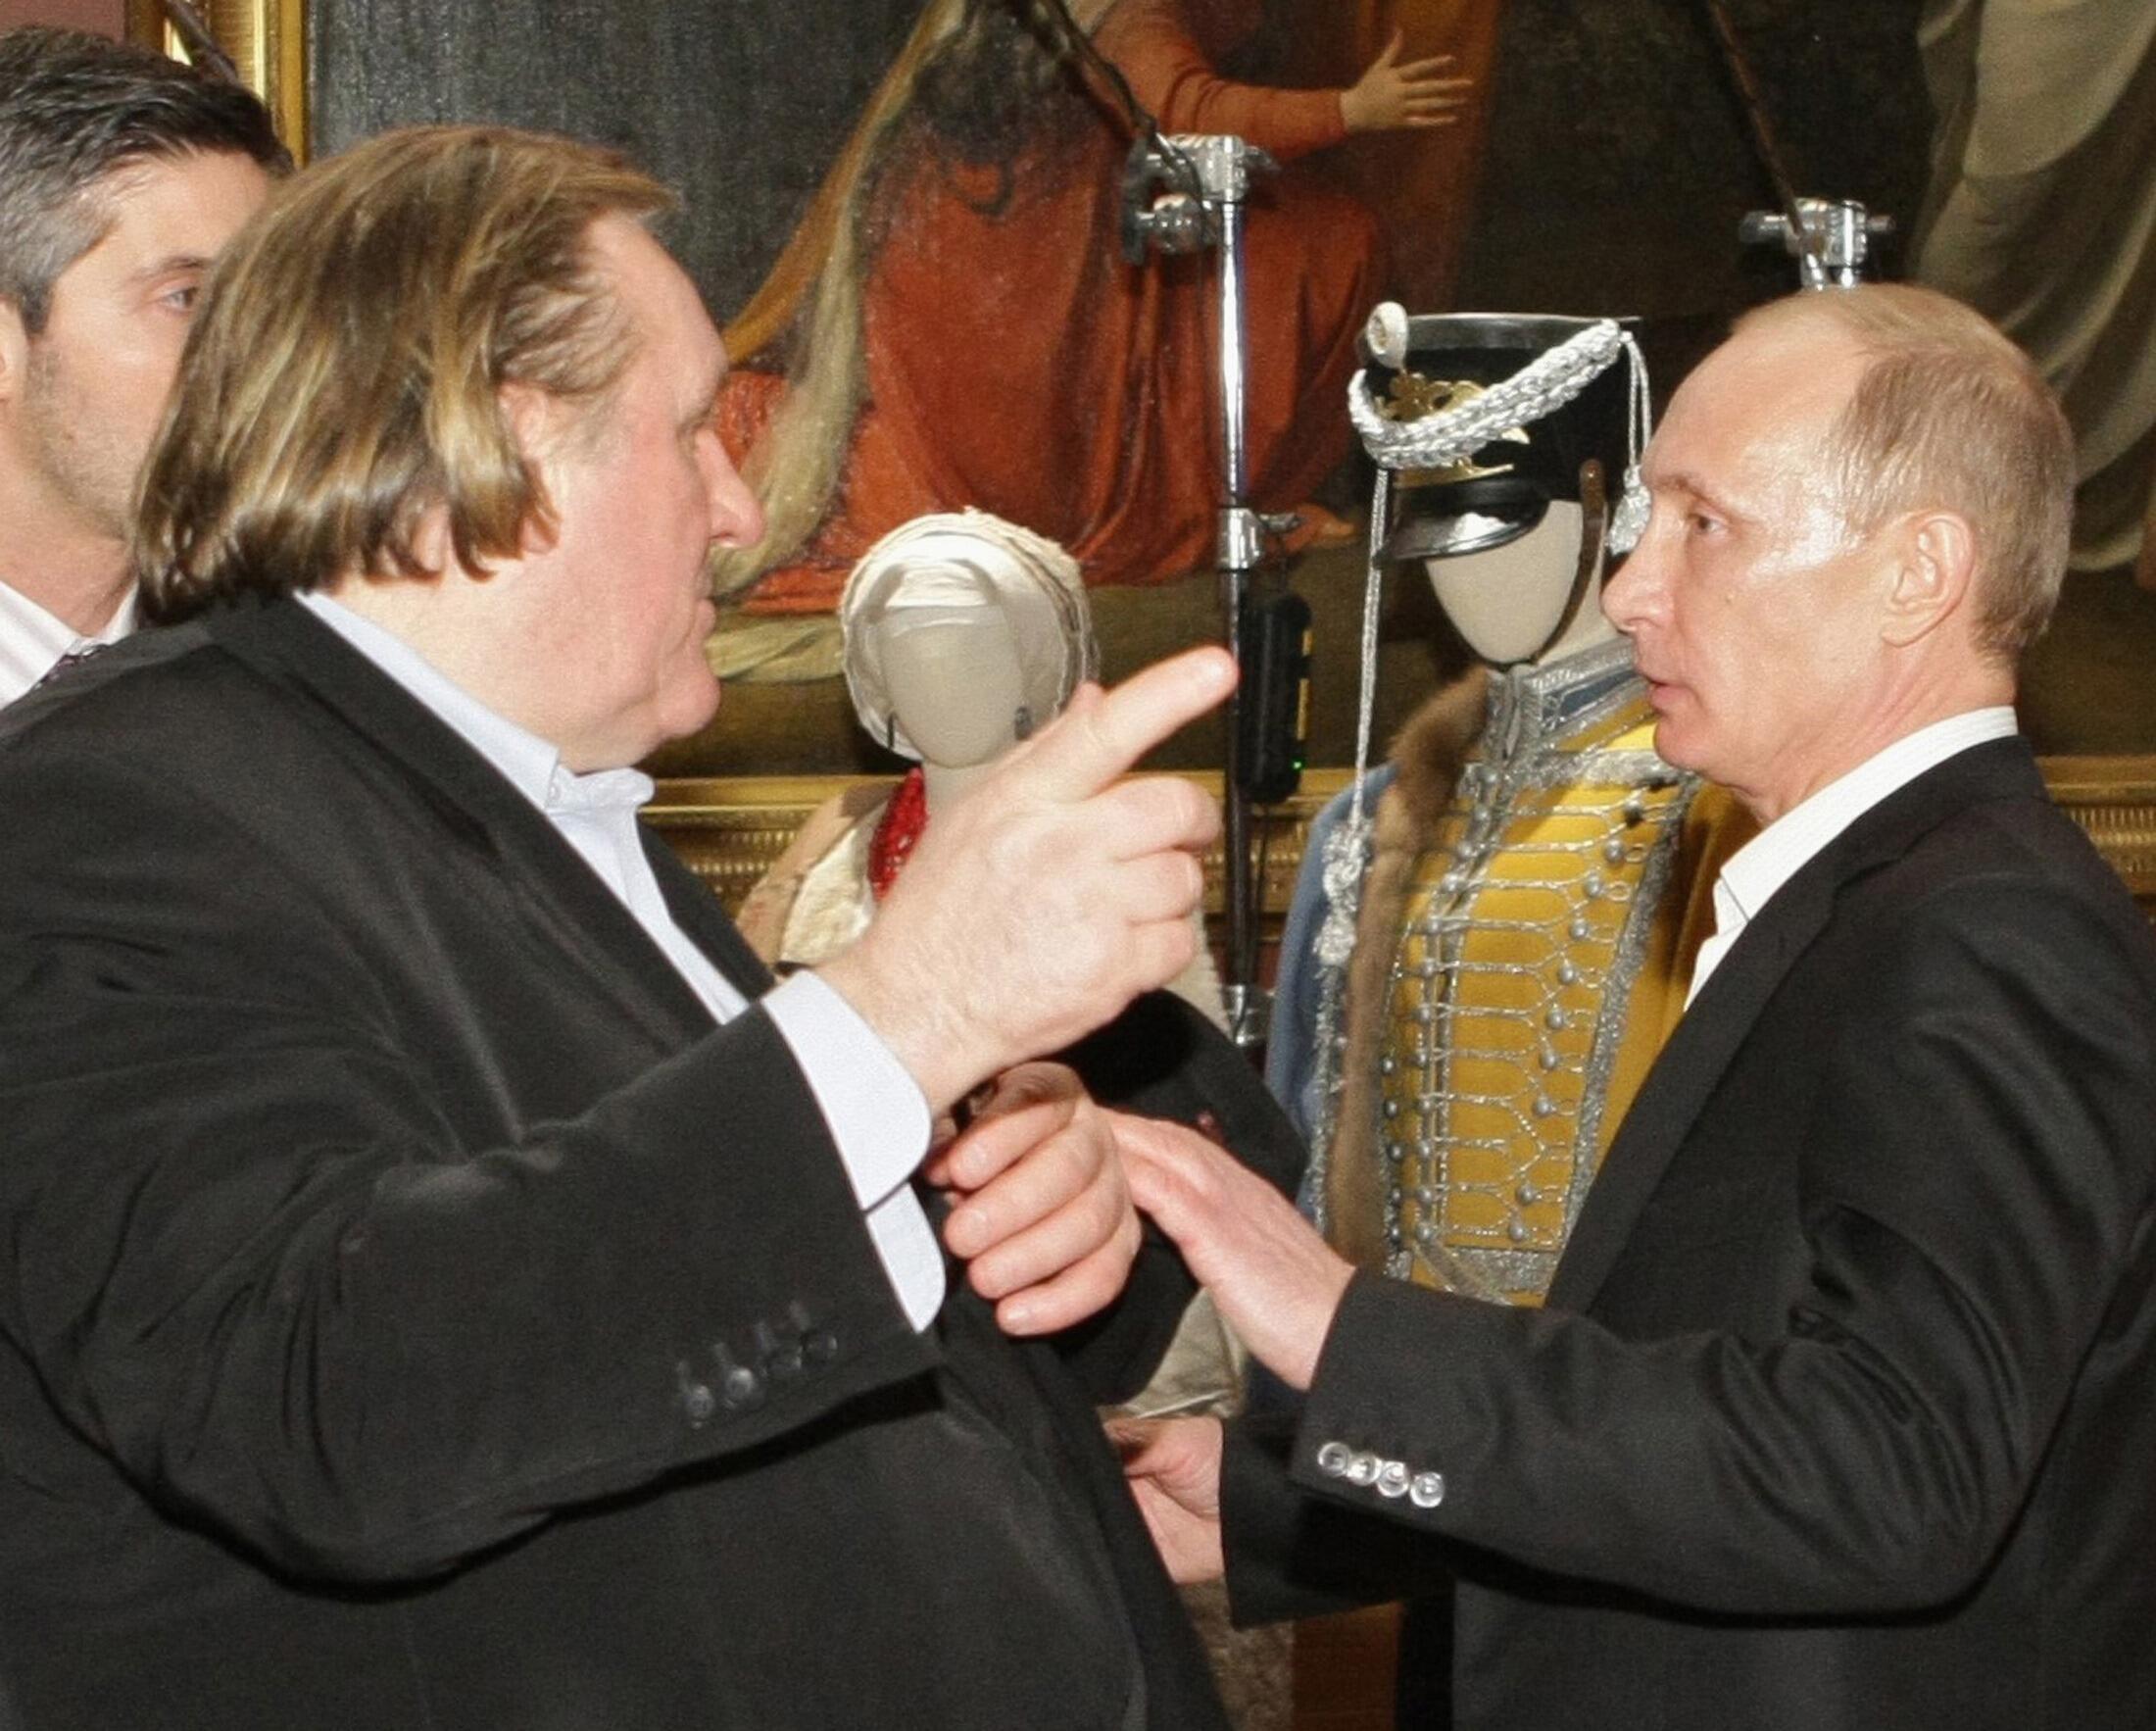 Gérard Depardieu has thanked Vladimir Putin for granting him Russian nationality